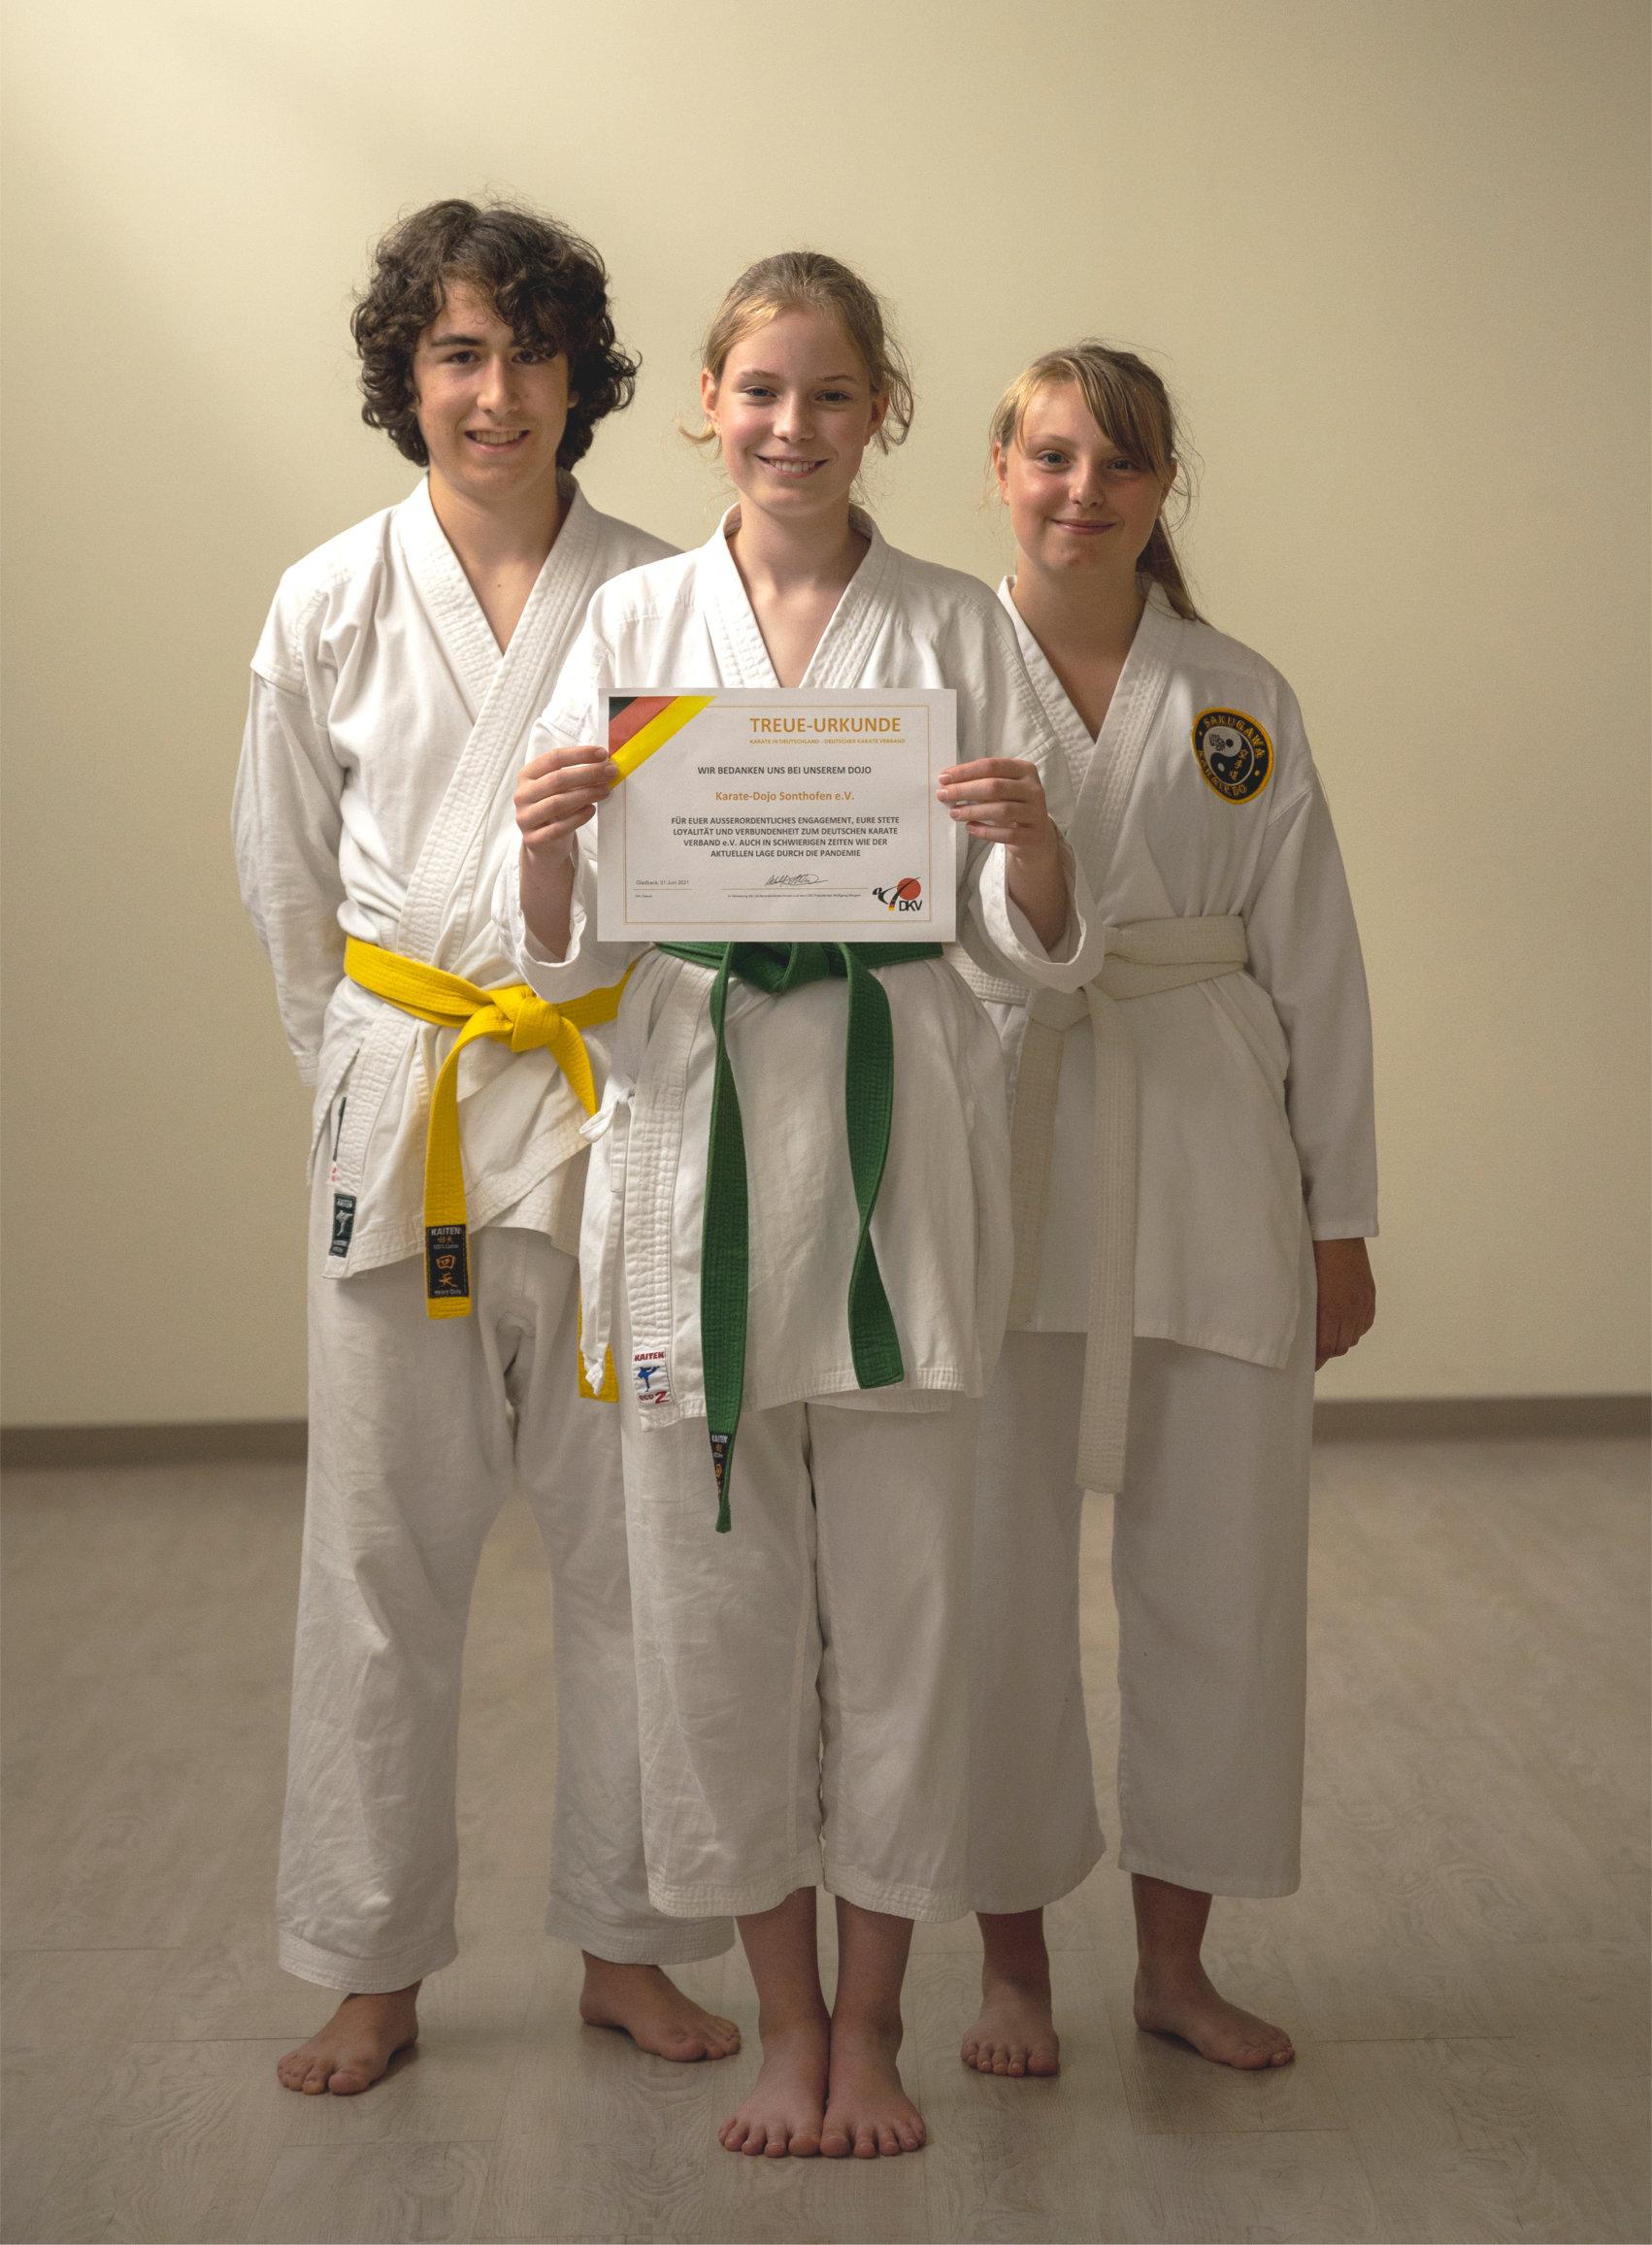 Treue zum Karate Dachverband DKV